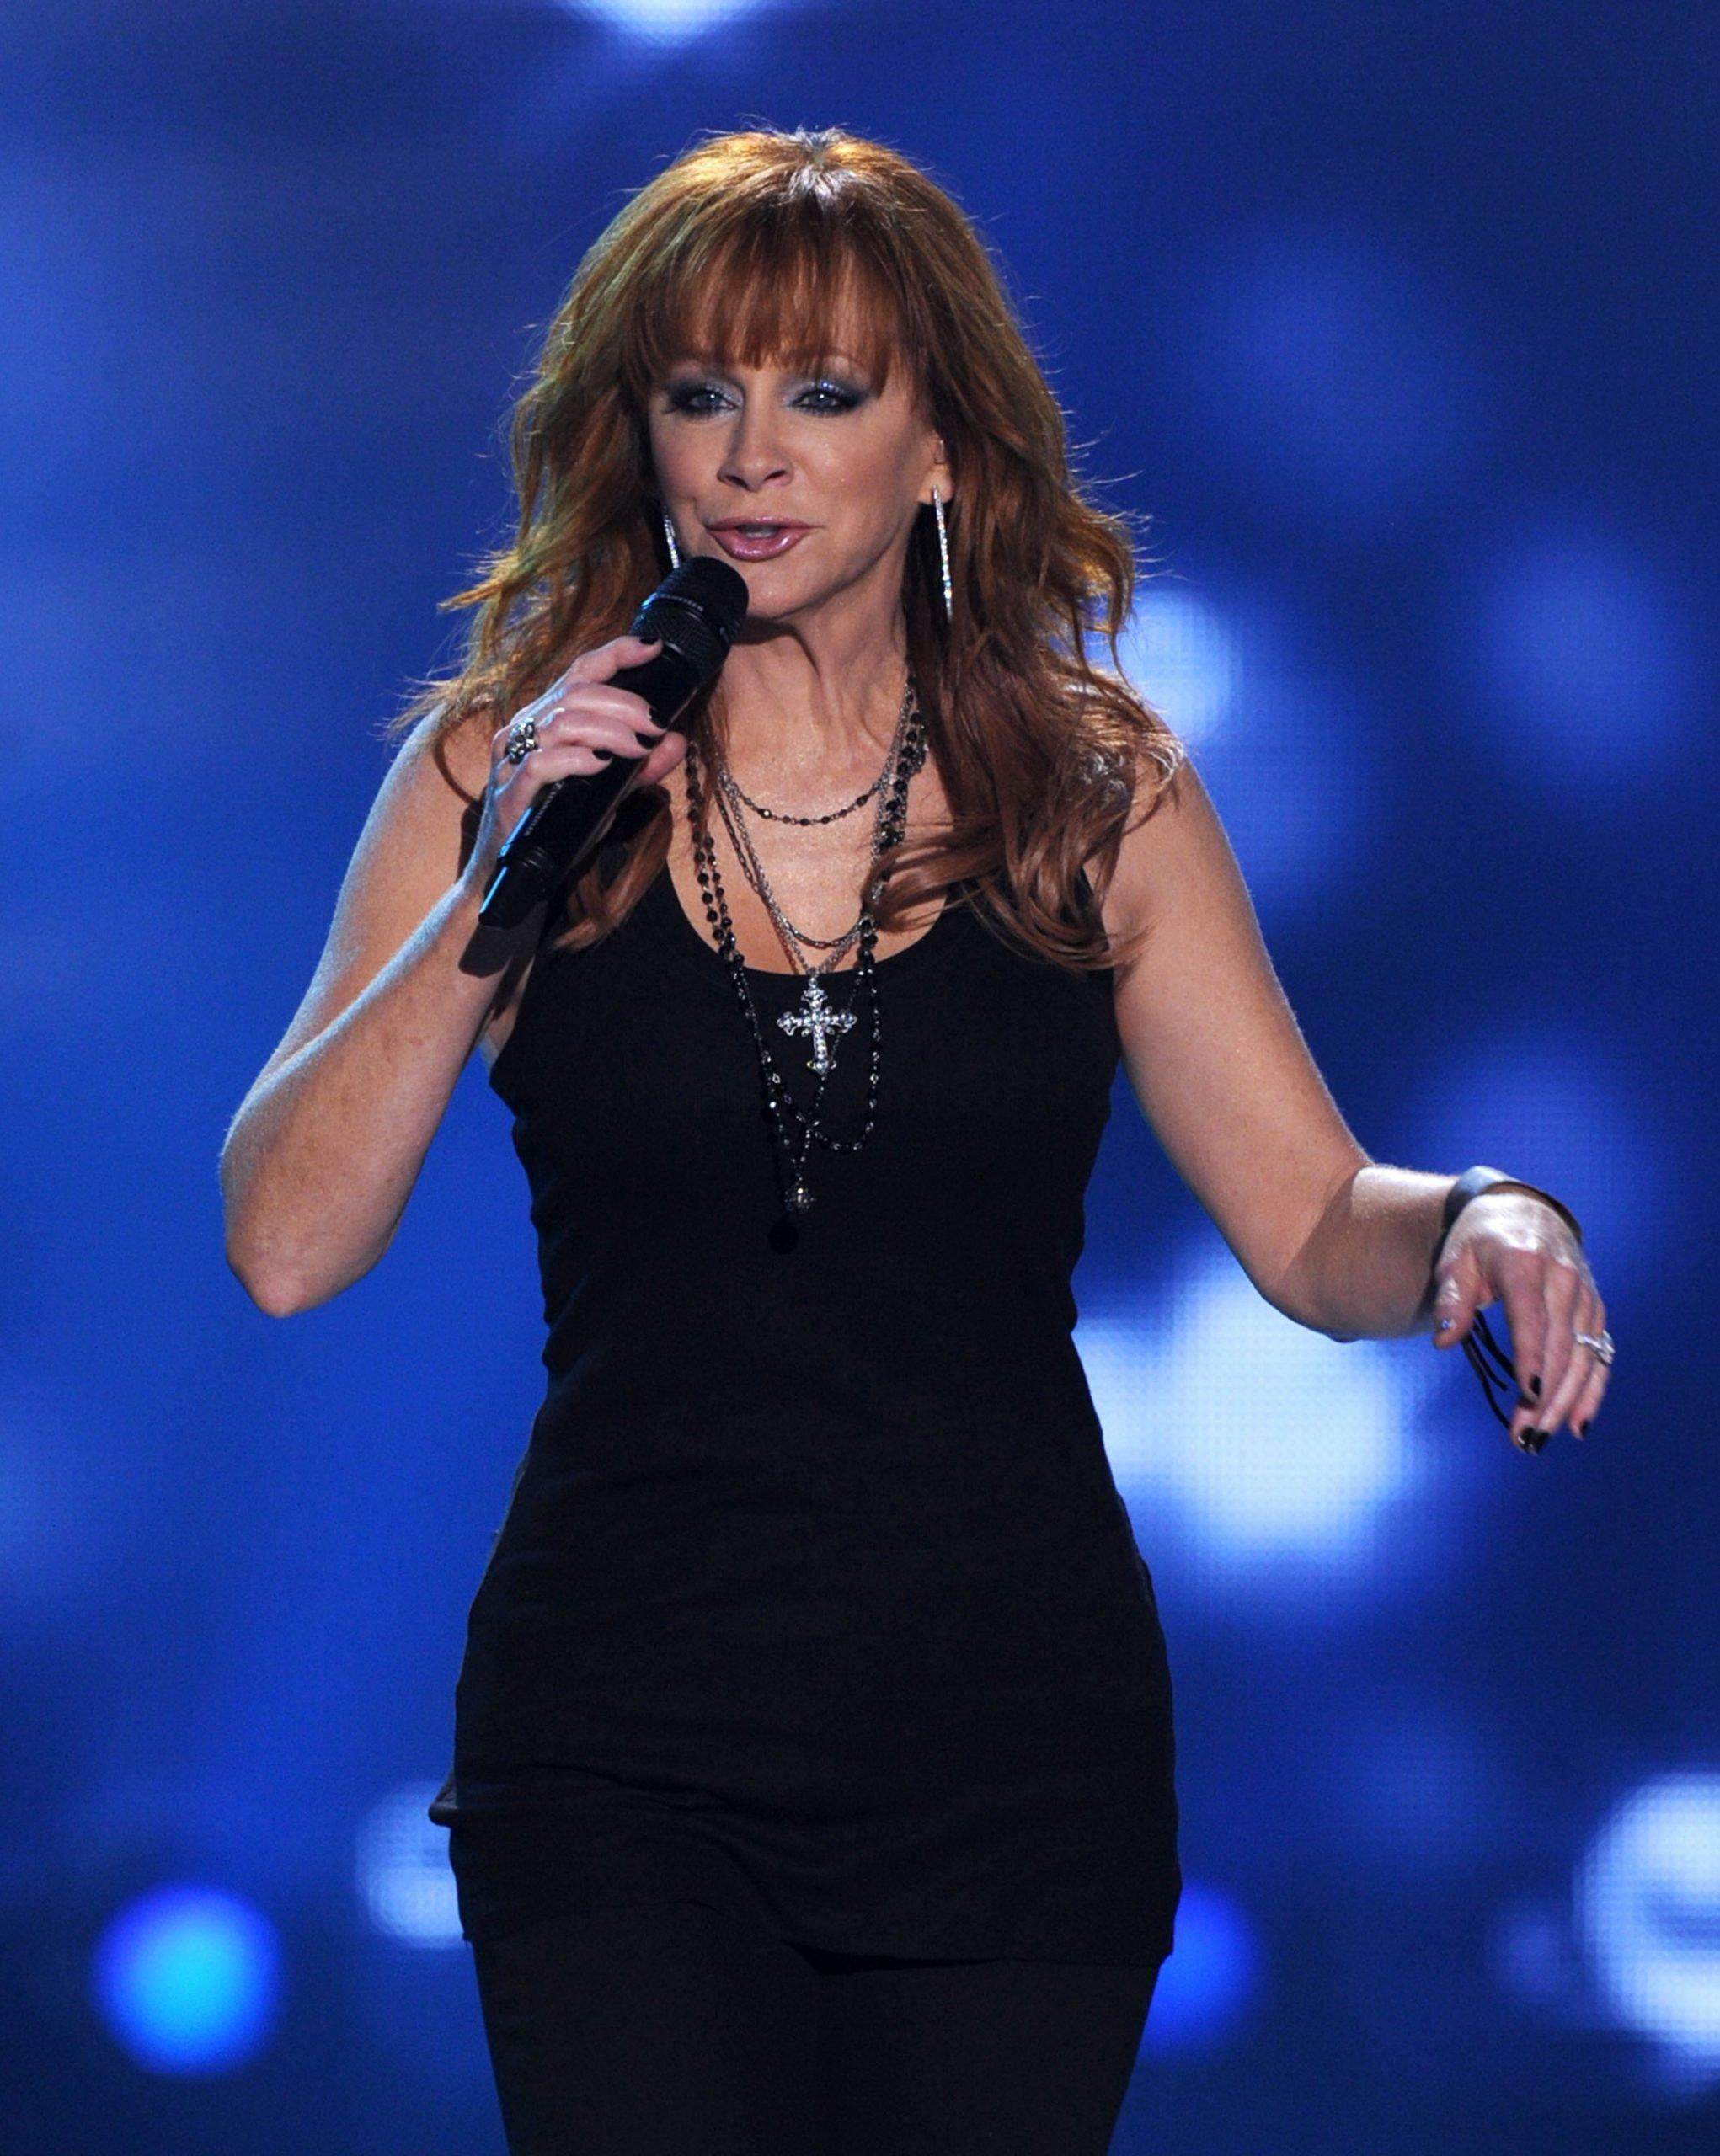 reba performing in the 2010s